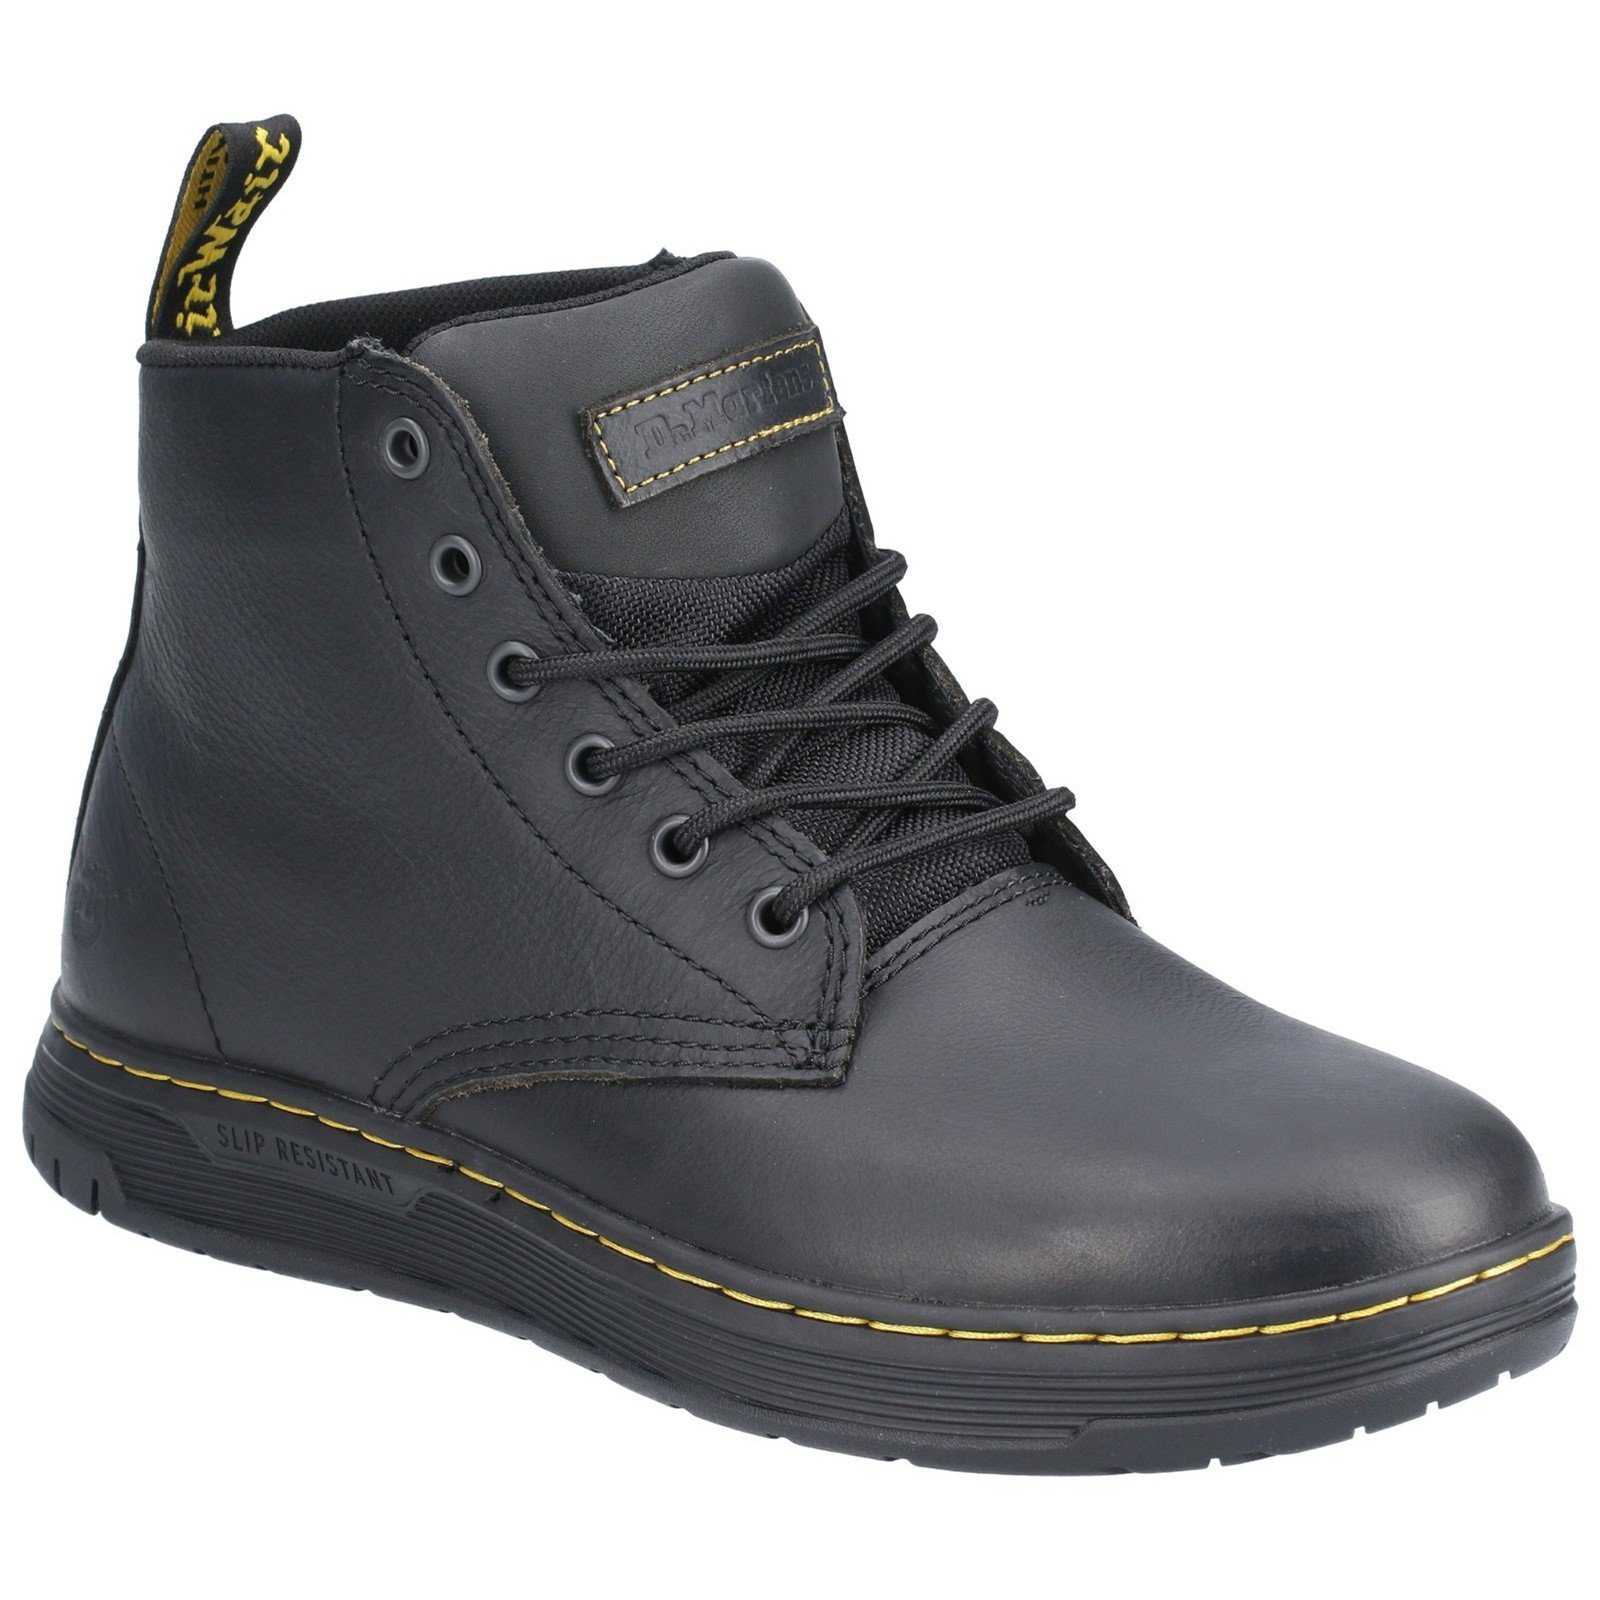 Dr Martens Men's Amwell Slip Resistant Leather Boot Black 29508 - Black 12